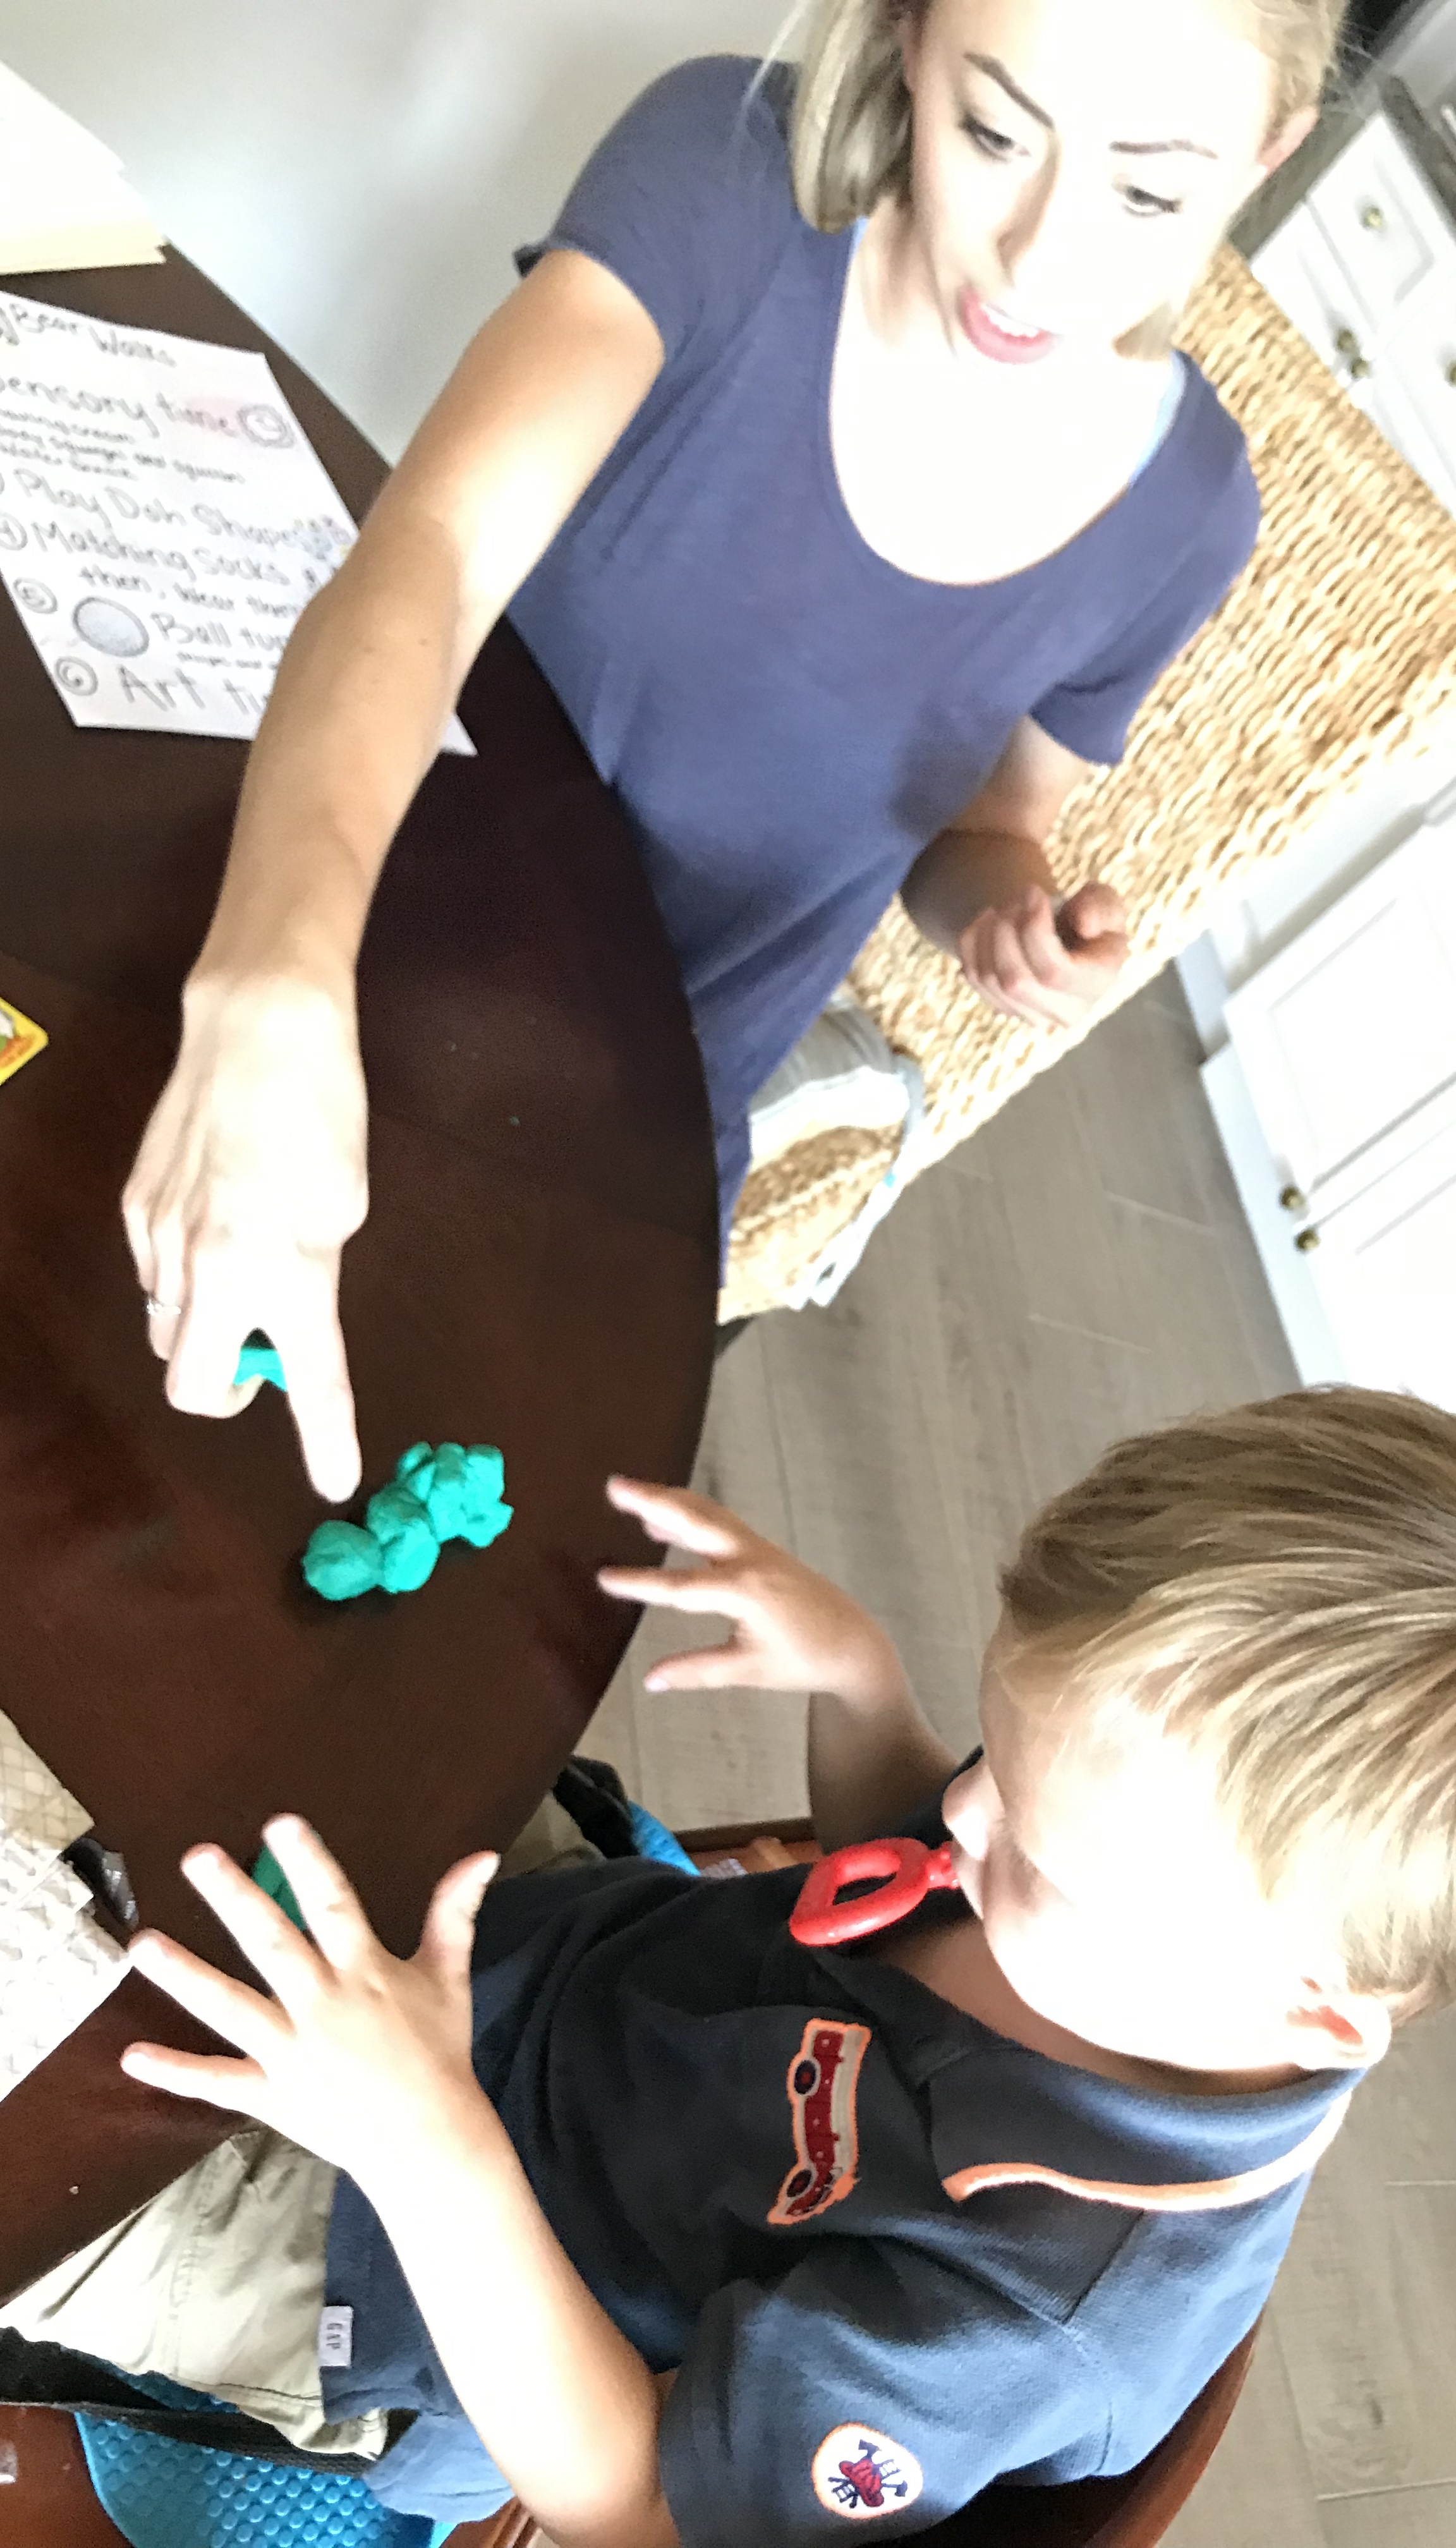 Woman showing young boy green Play Doh